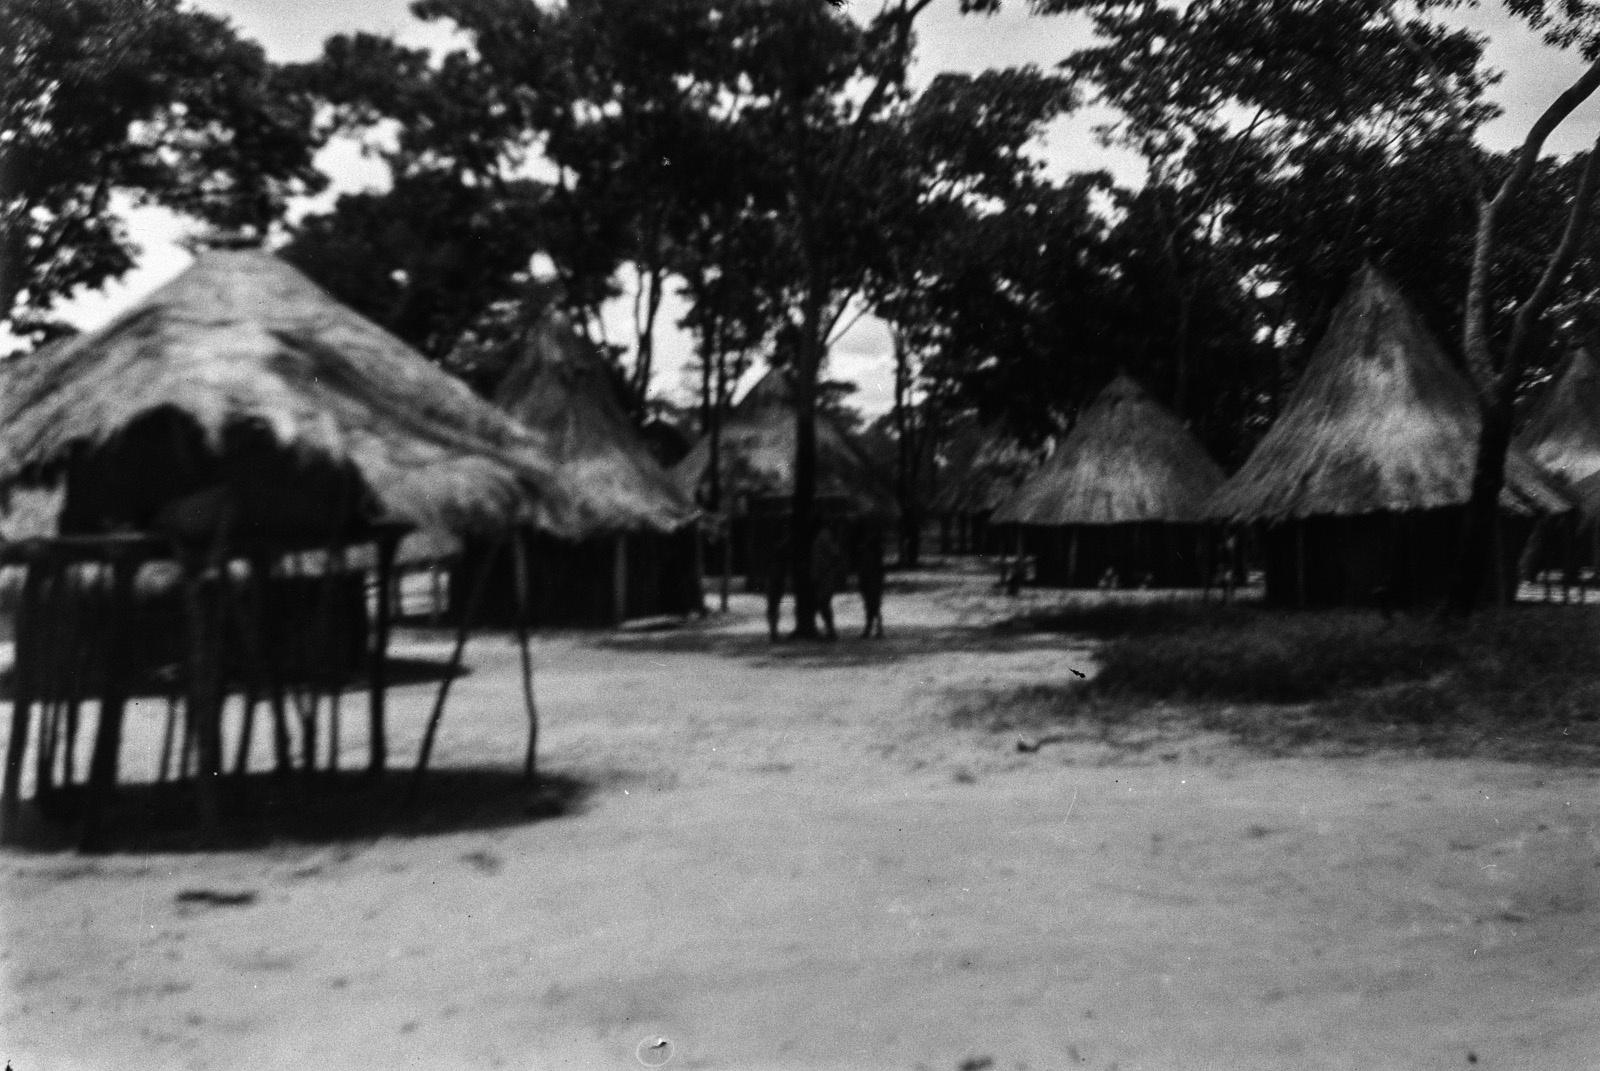 Между Капири Мпоши и рекой Лунсемфва. Деревня чеве, Рондавели и курятник слева